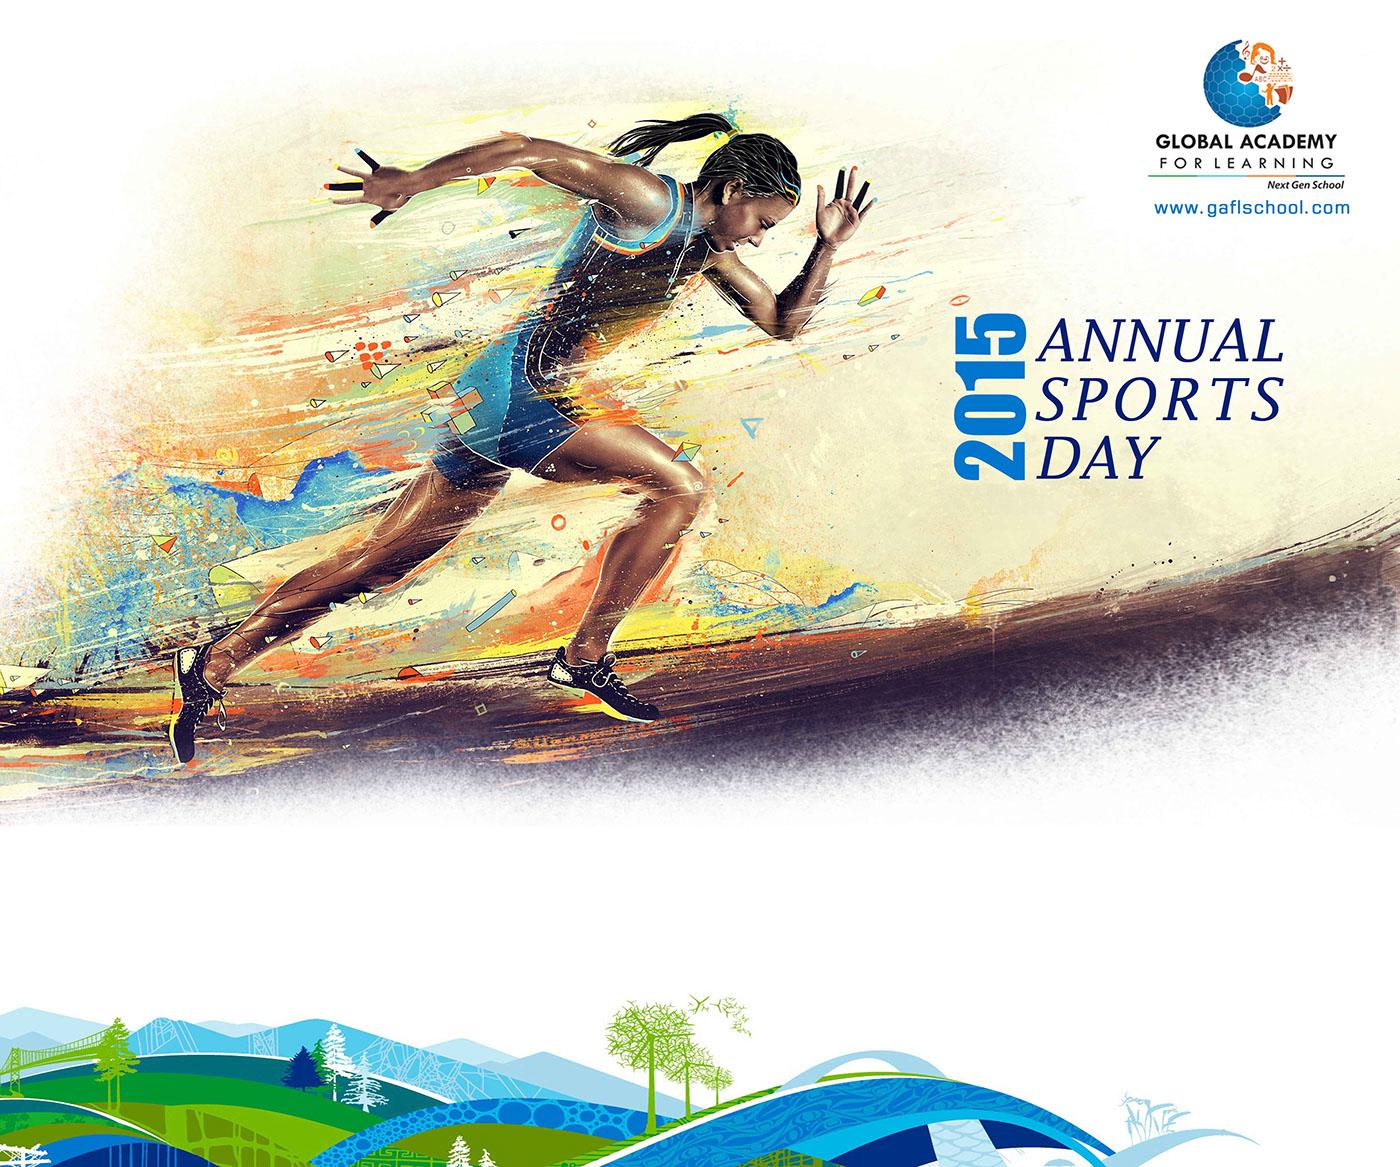 gaflschool sports day poster design on